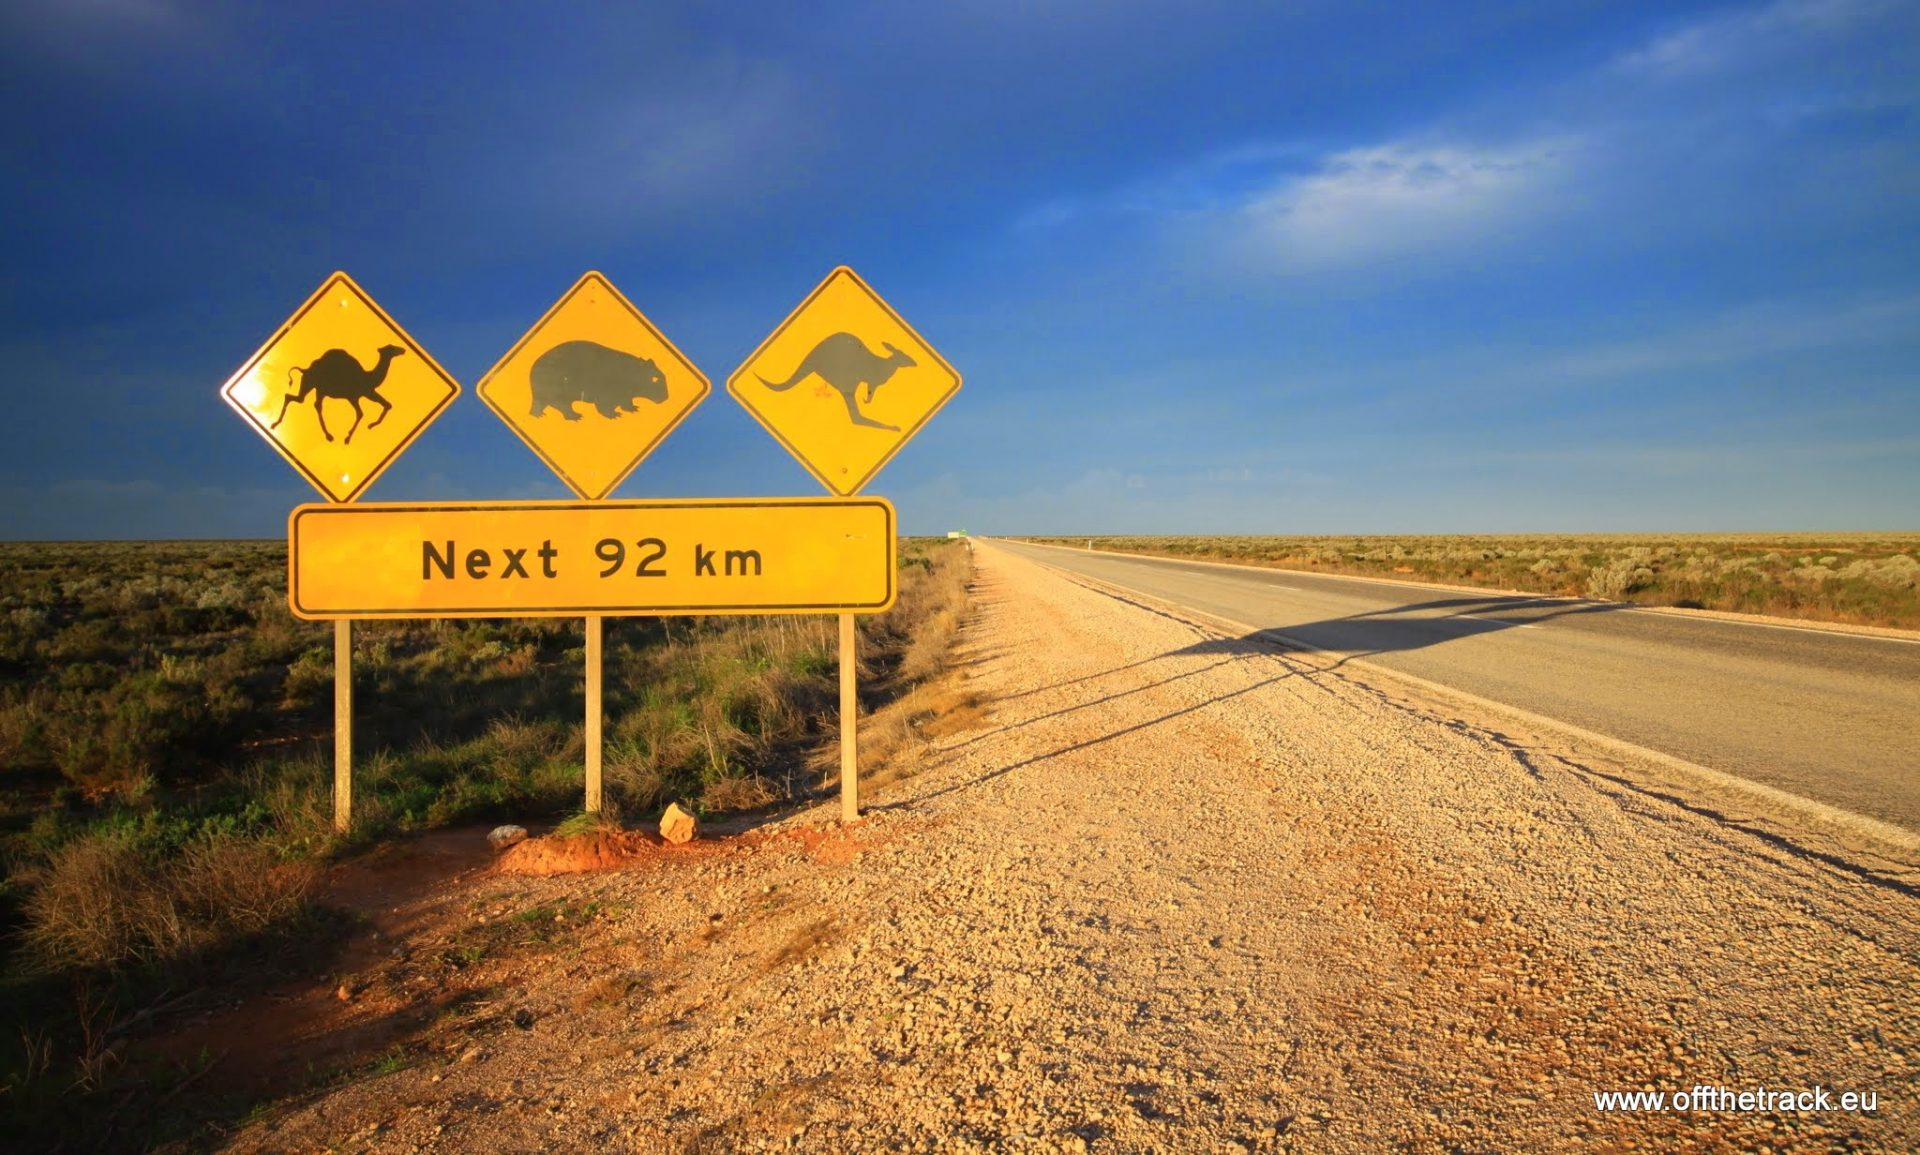 Nullarbor Plain – Najprostsza droga świata